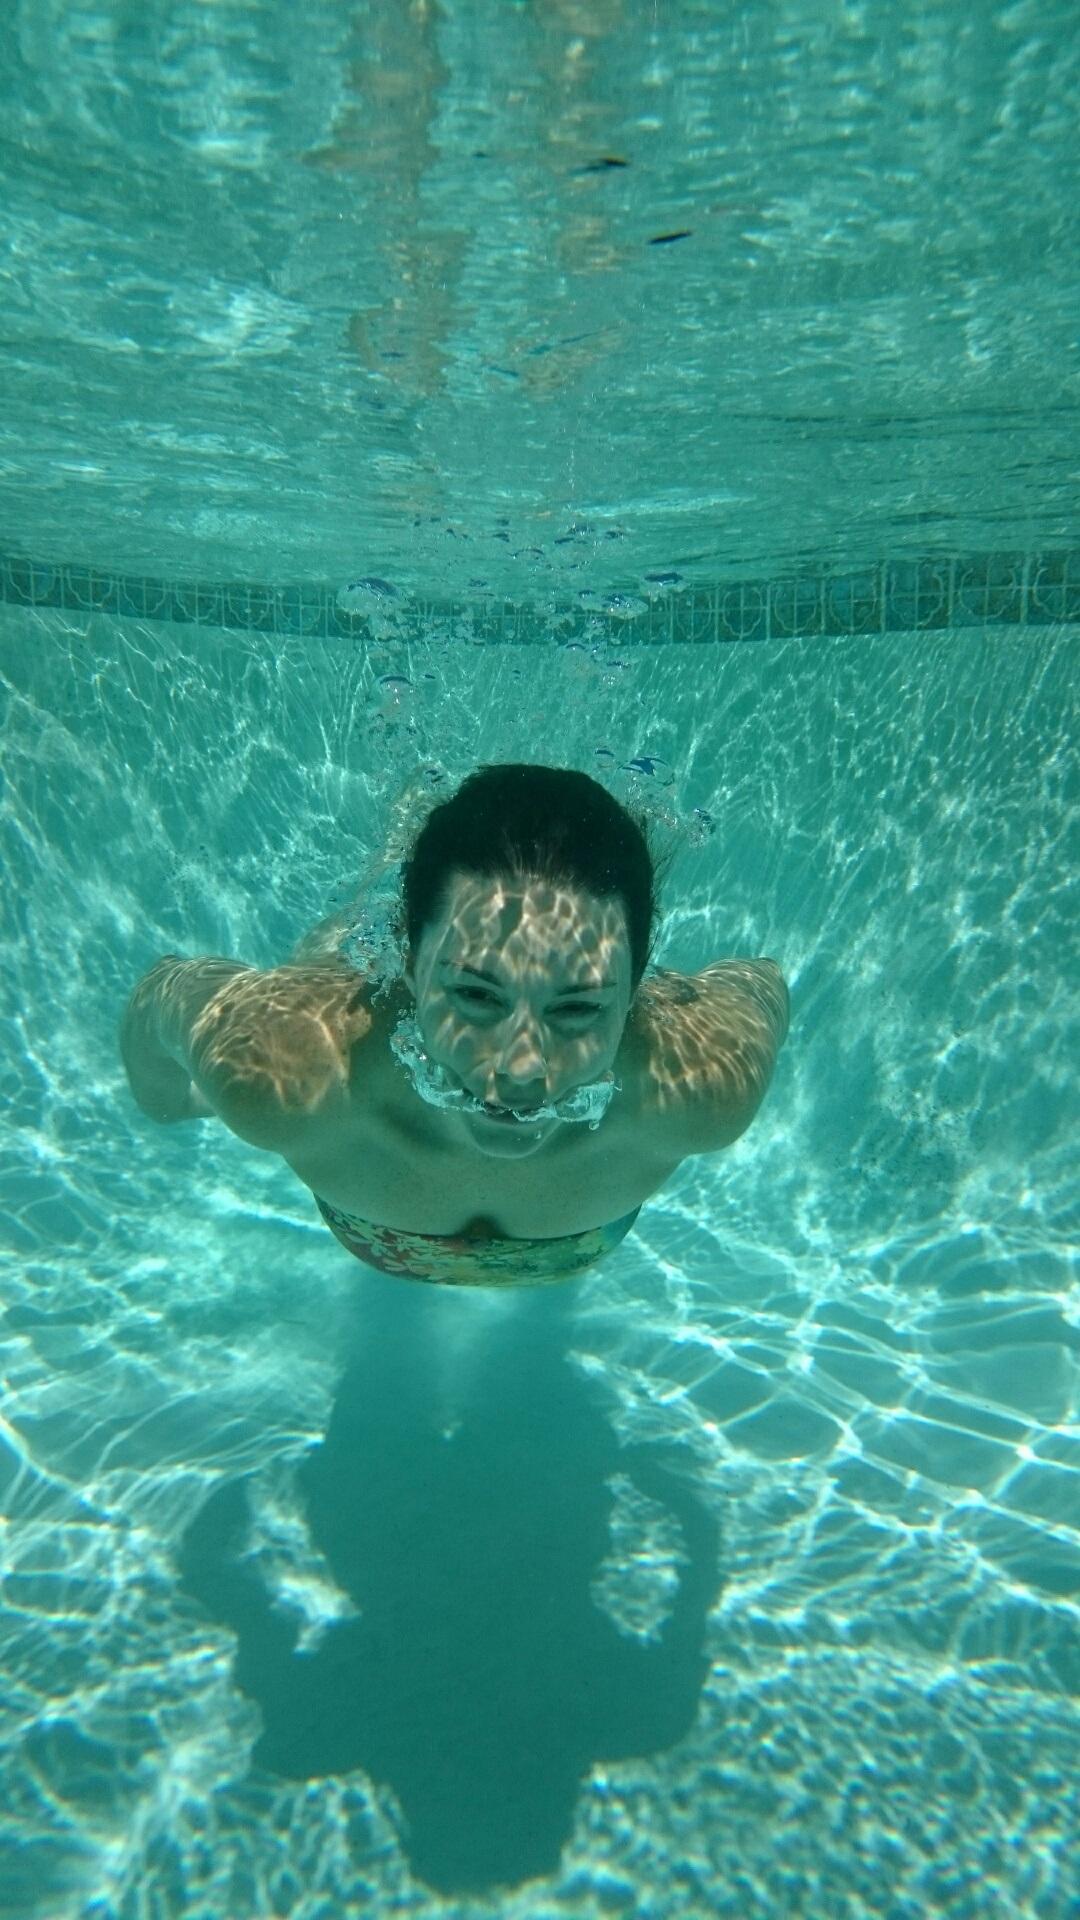 Free Swimming Pool: Free Images : Diving, Underwater, Swim, Swimming Pool